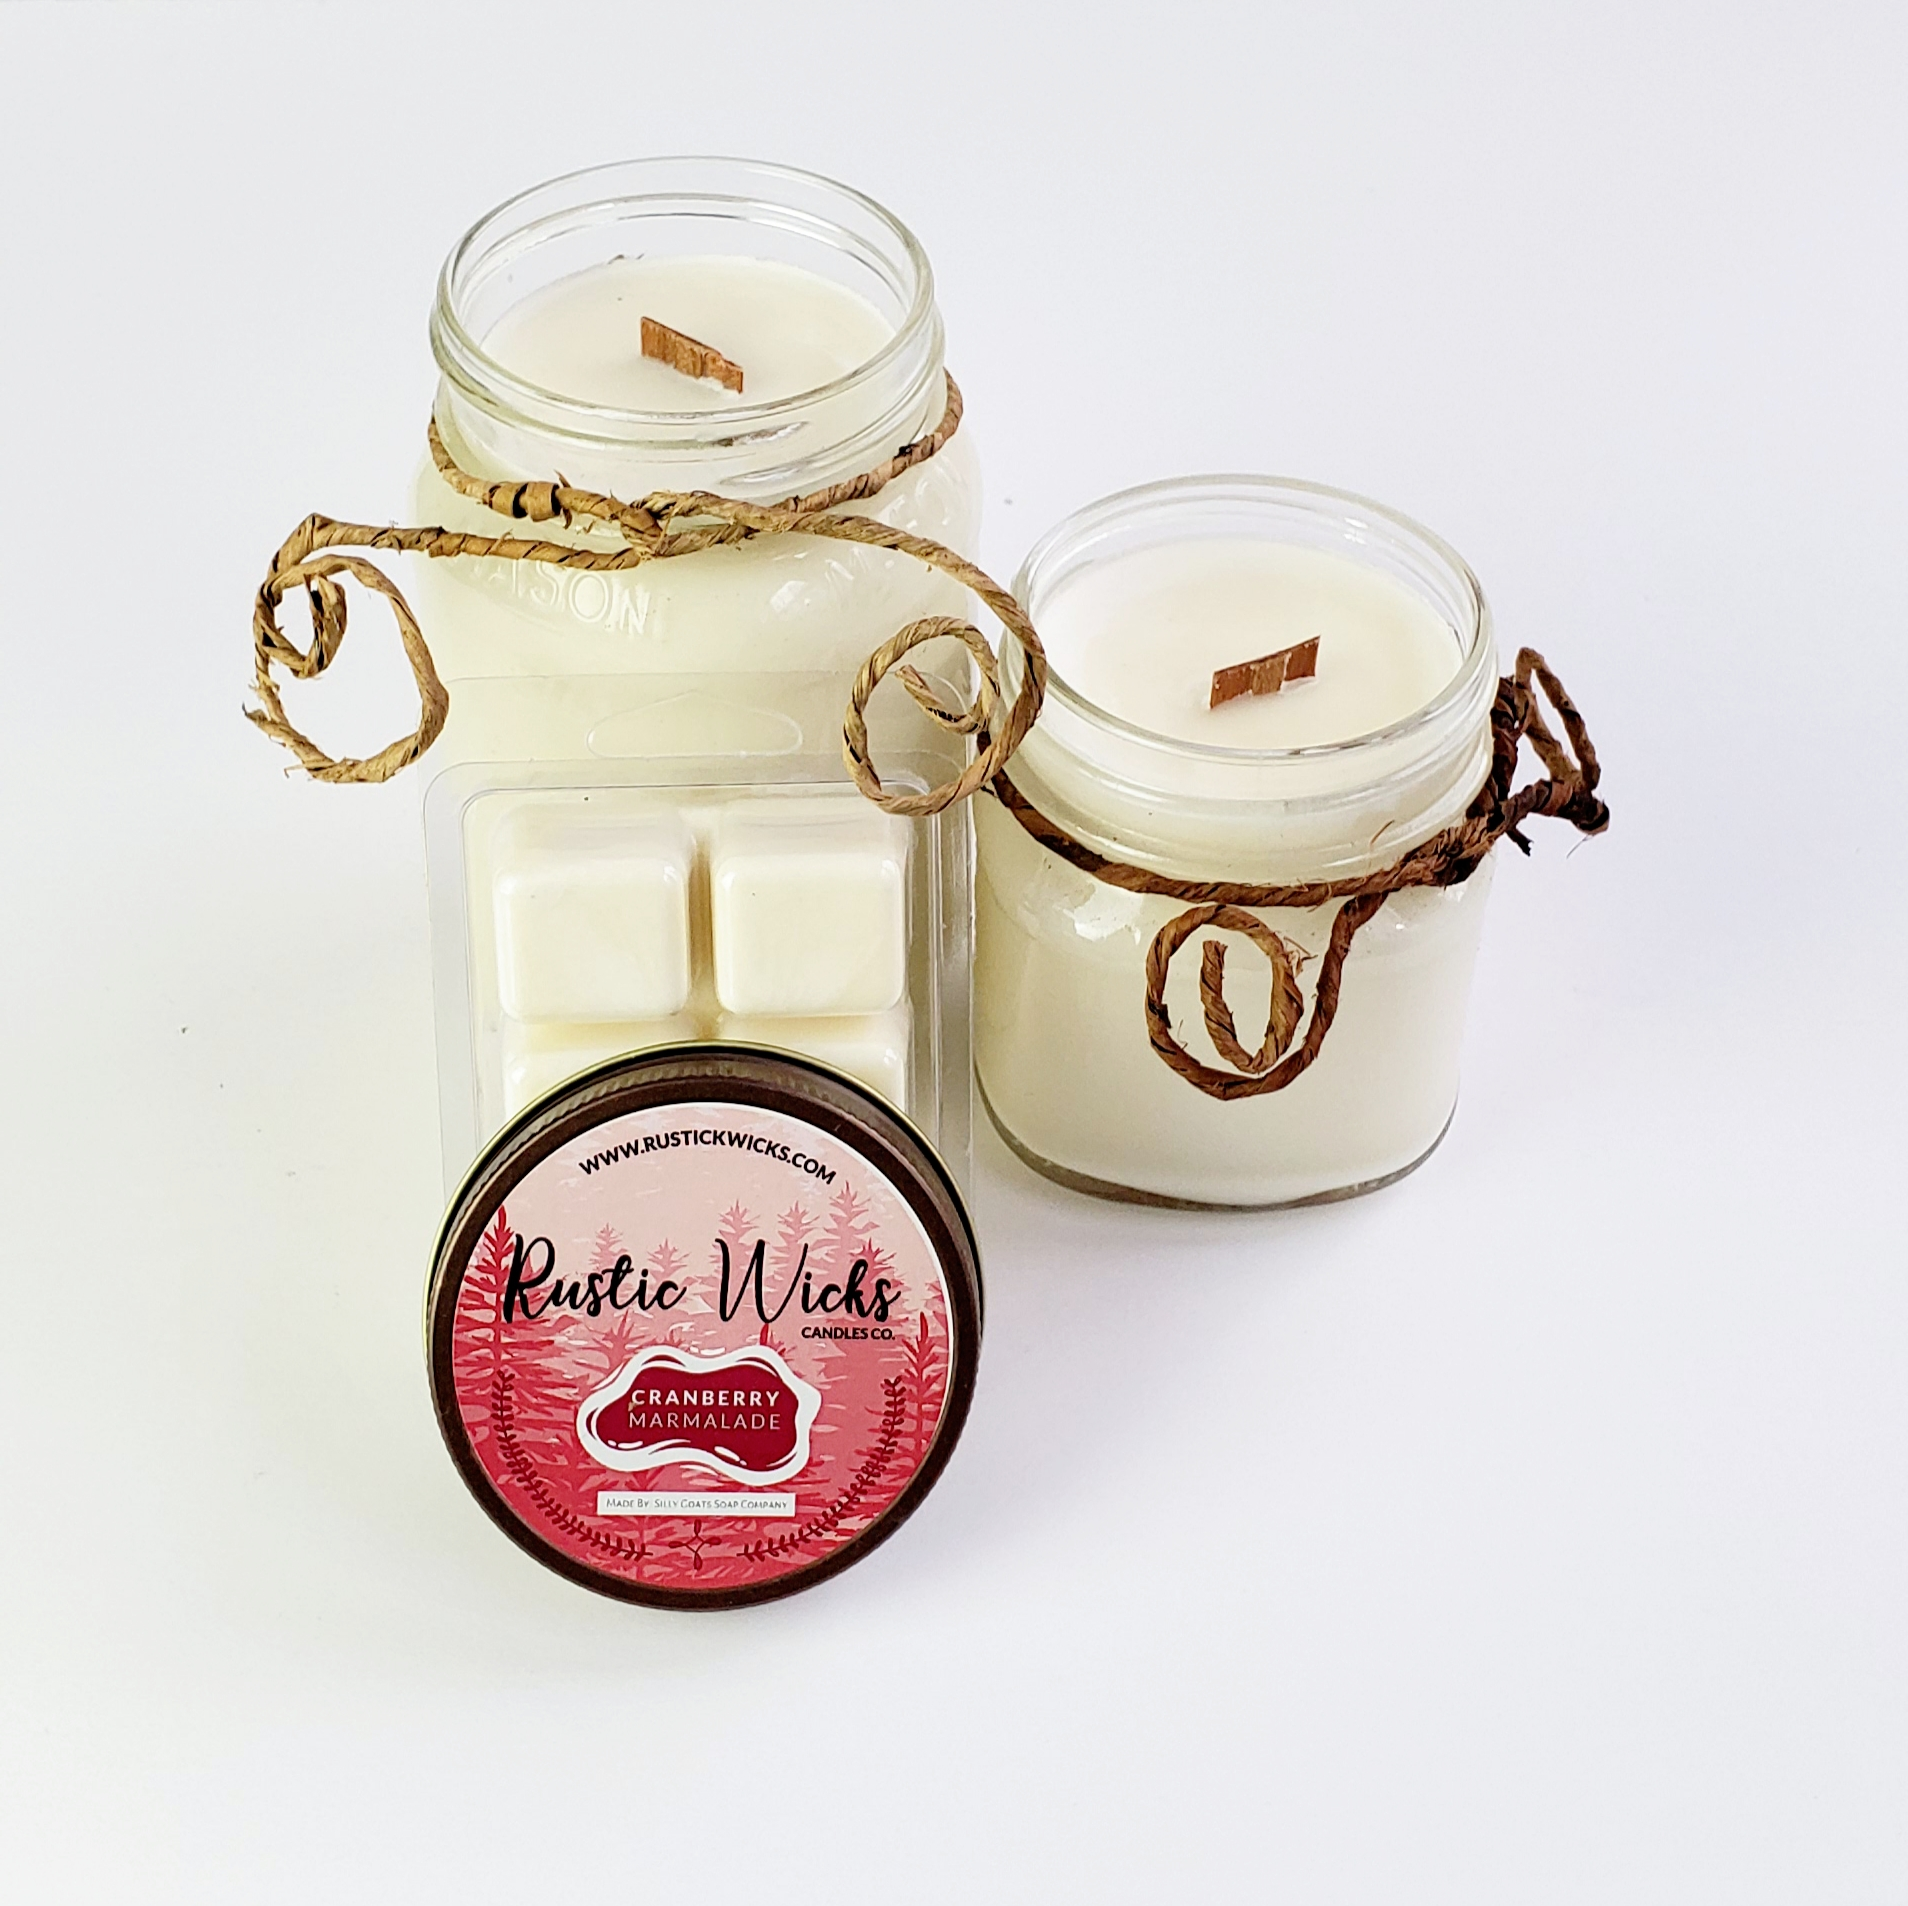 Cranberry Marmalade-Mason Jar Soy Candles-16 ounce soy candle-Cranberry Marmalade Candle-Soy Candle-Cranberry Marmalade Soy Candle-winter